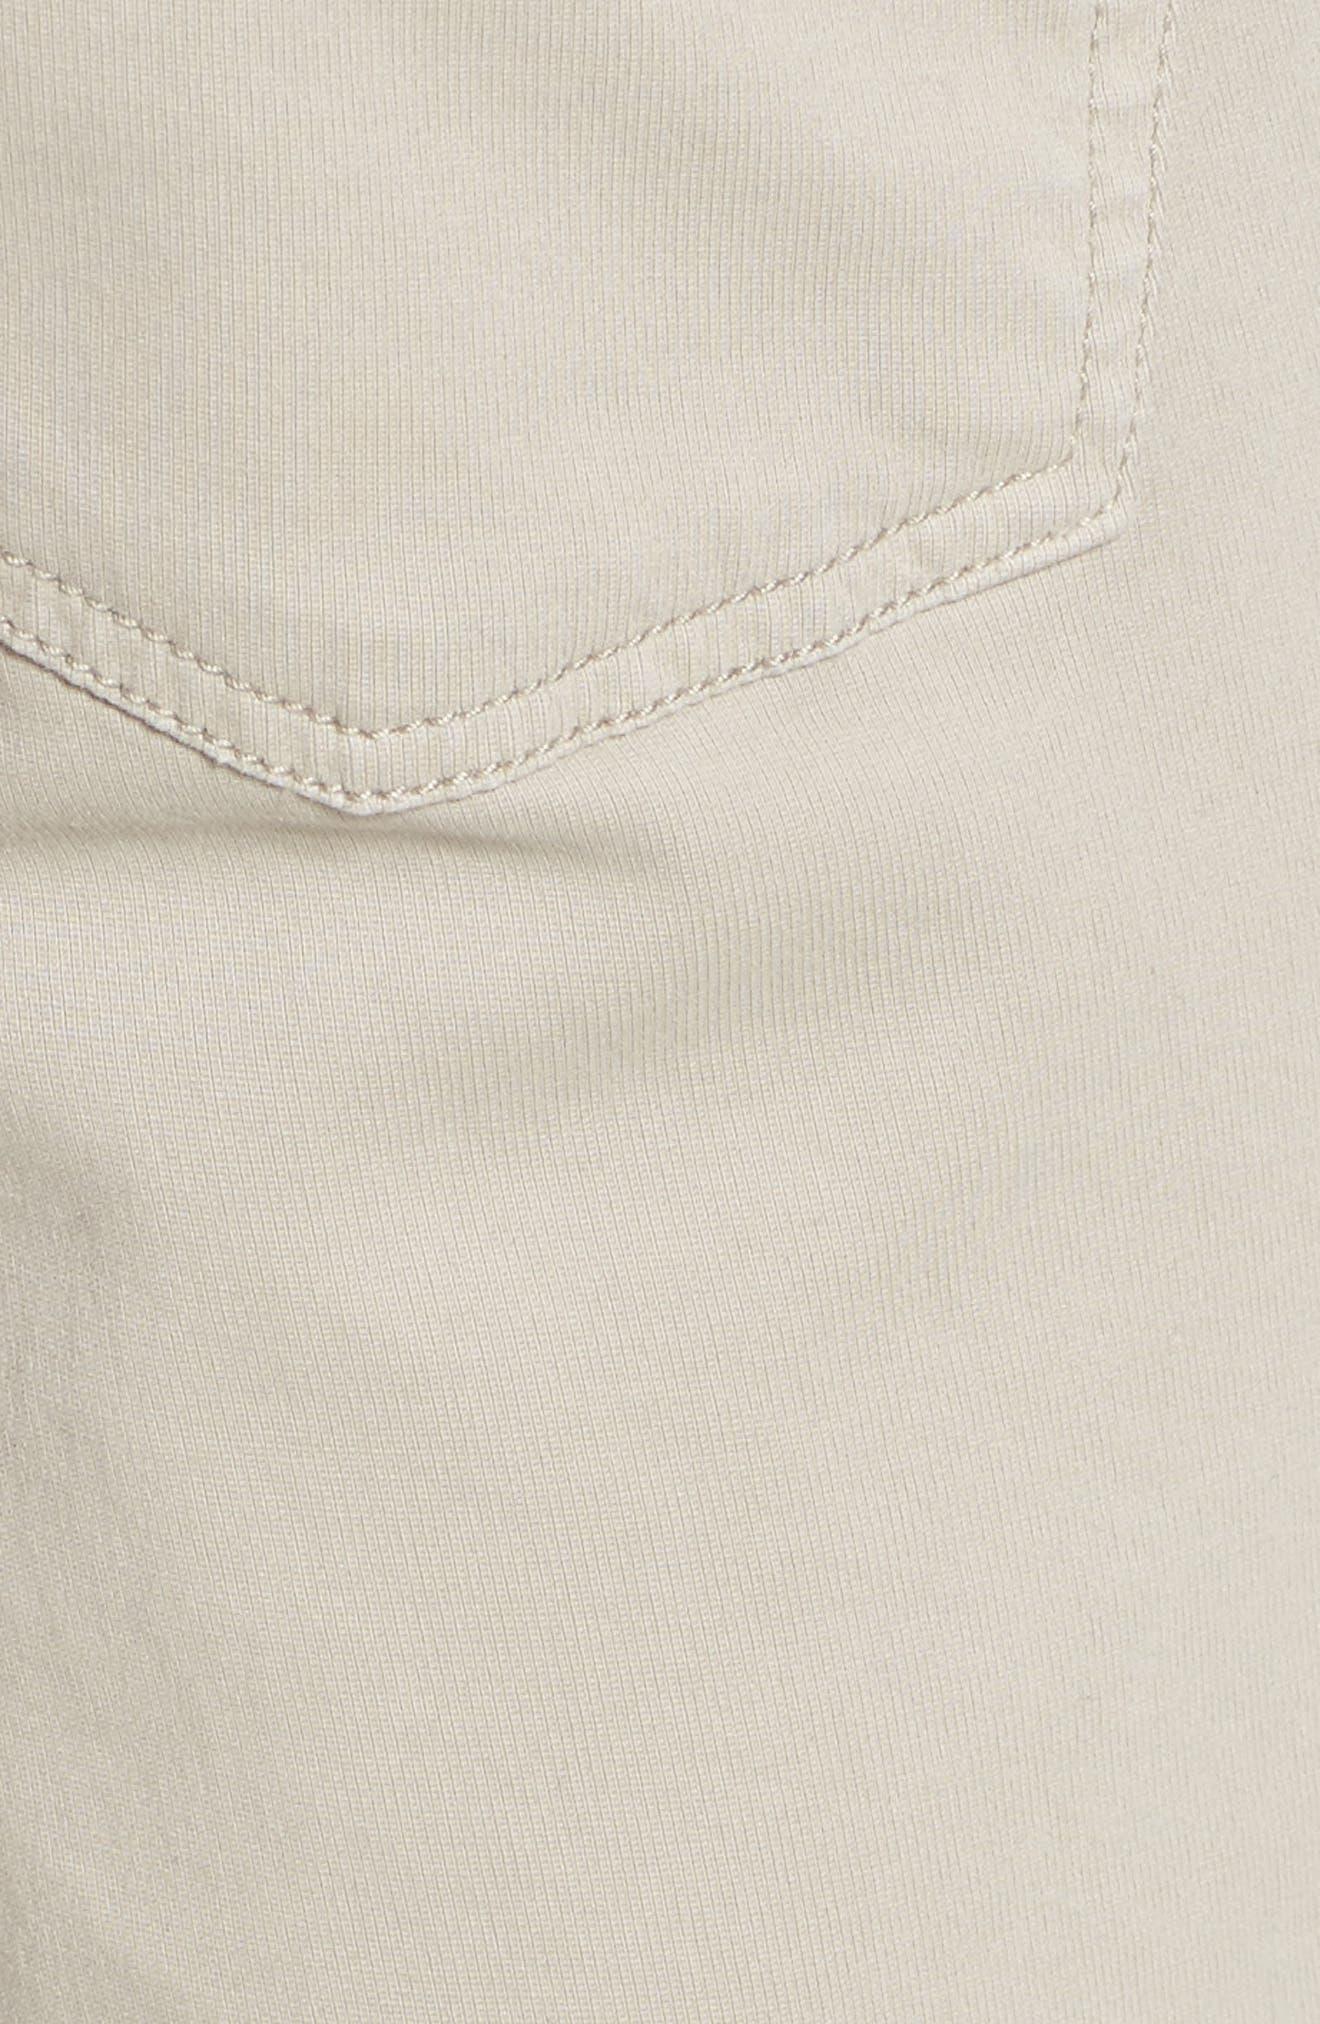 Five-Pocket Straight Leg Pants,                             Alternate thumbnail 5, color,                             289